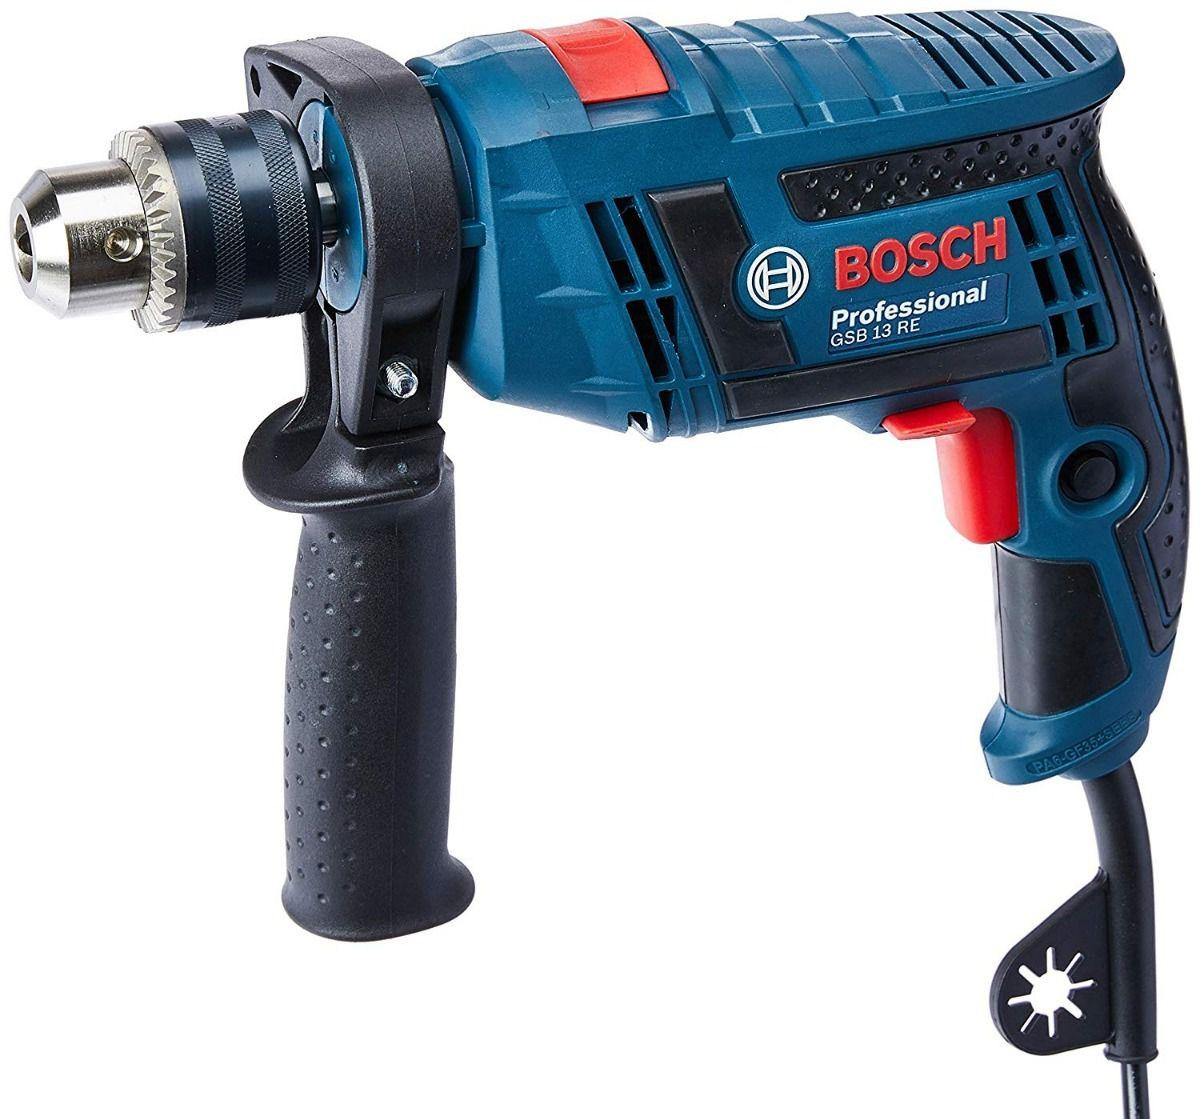 Furadeira Bosch de Impacto GSB 13 RE Professional 650W